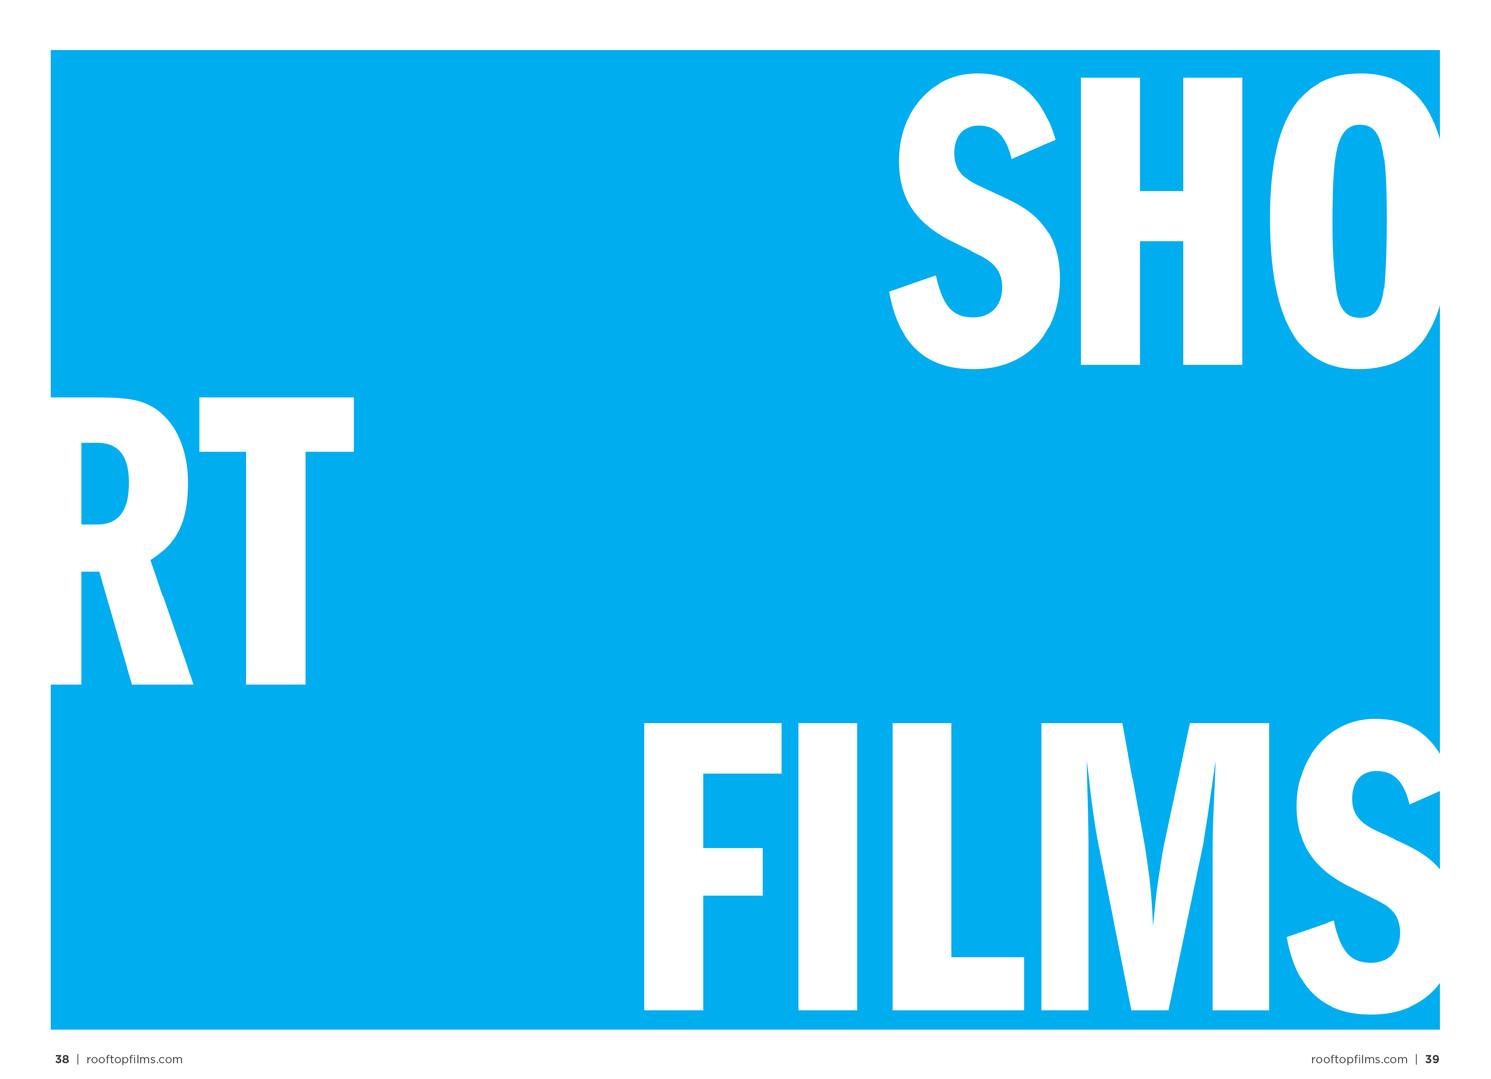 Short Films Intro Spread